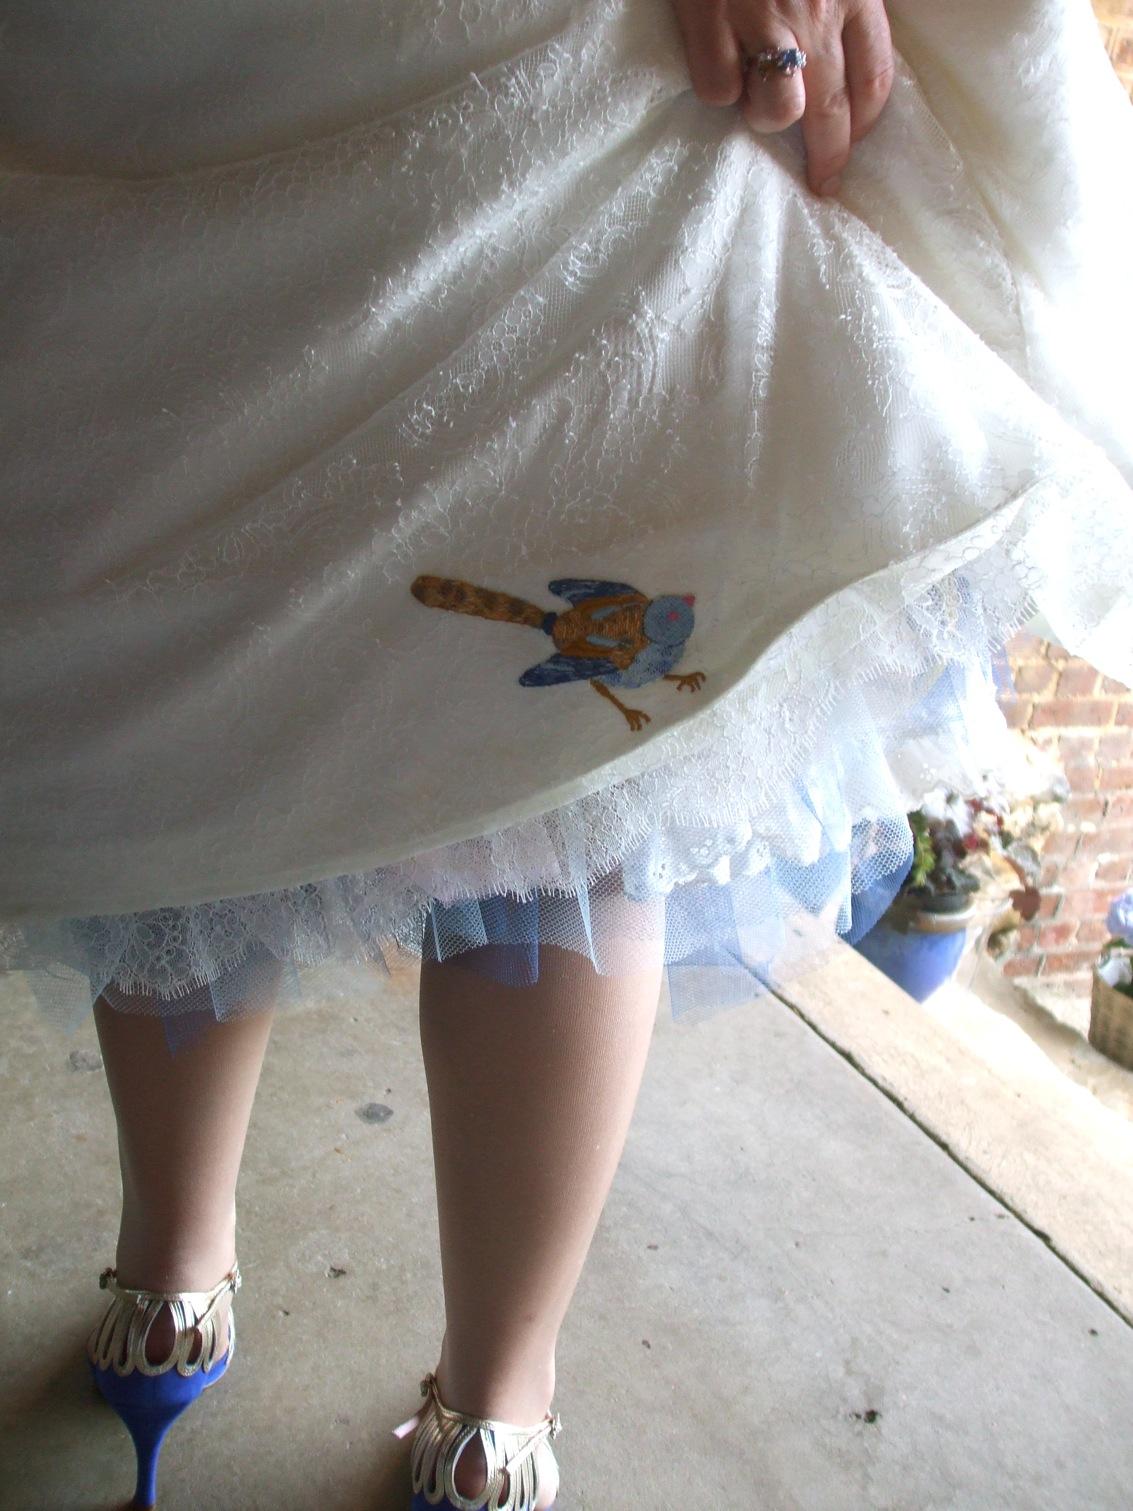 http://1.bp.blogspot.com/_2m7es0KZslo/TE3ejkI4hlI/AAAAAAAABAY/evLgmredJ3w/s1600/bird+with+netting.JPG